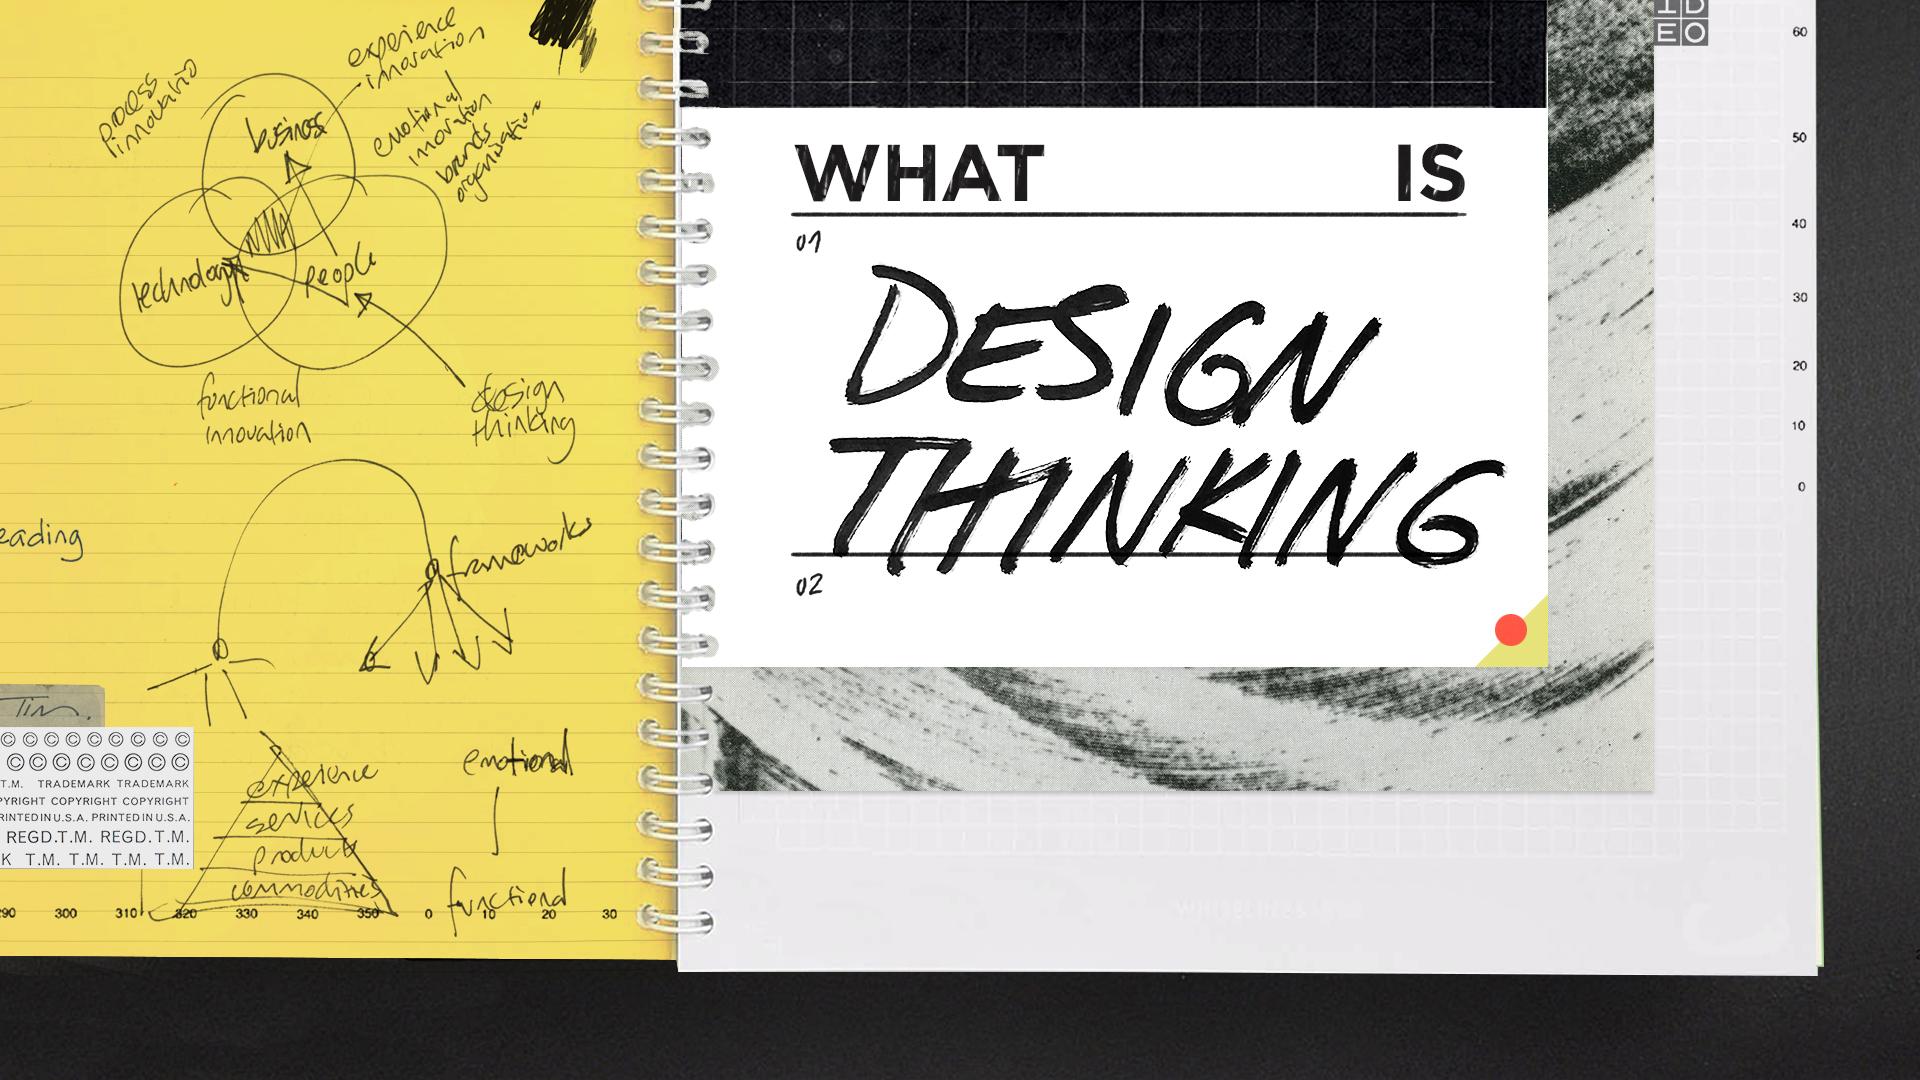 SH_0019_DESIGN_THINKING_102518.jpg